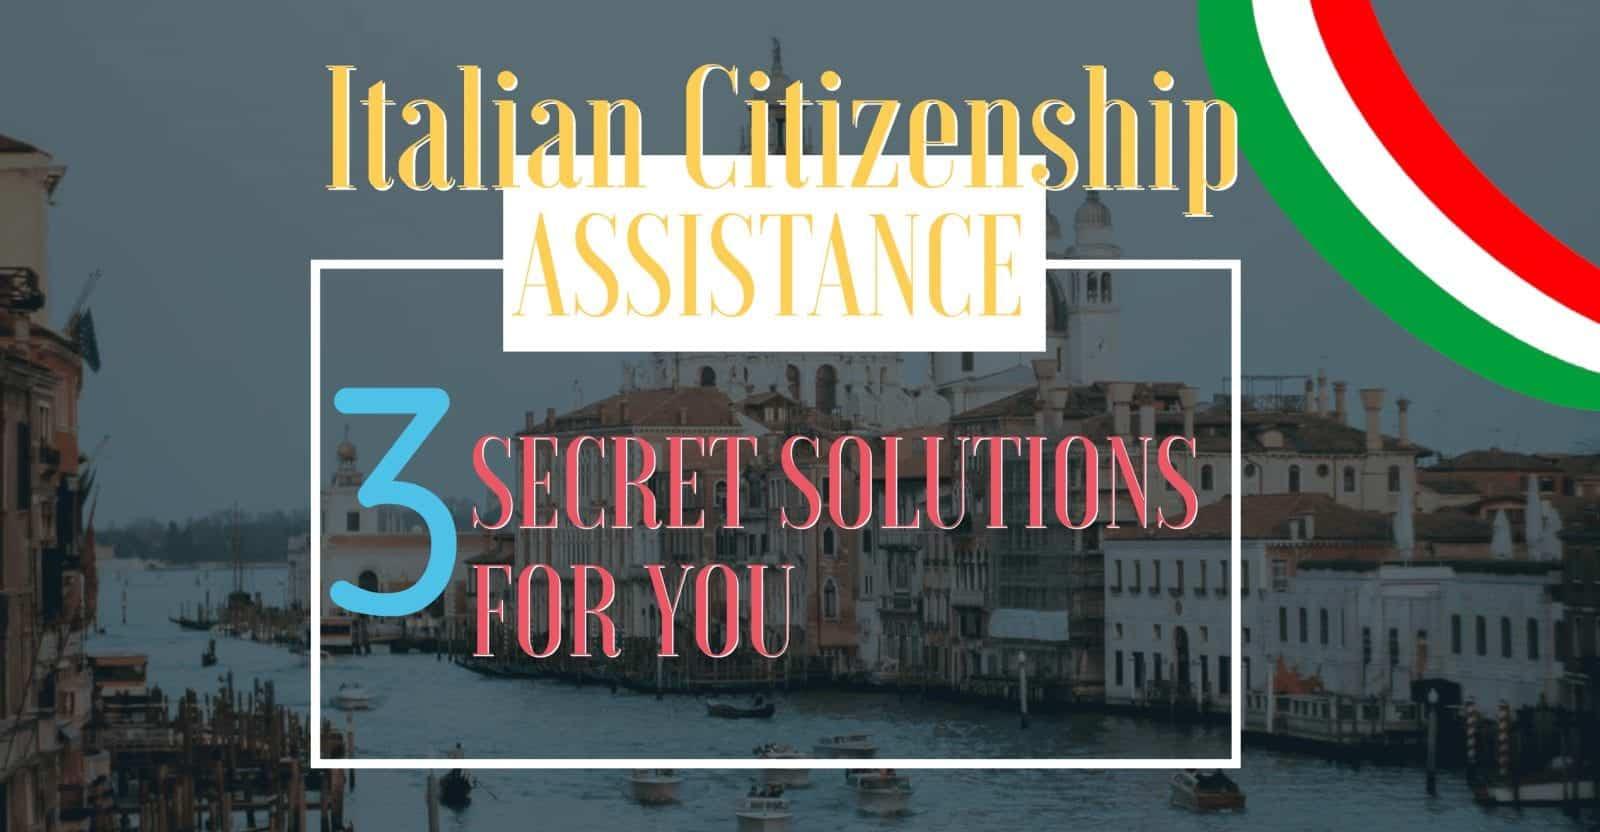 ITALIAN-CITIZENSHIP-ASSISTANCE-Italian-dual-citizenship-italian-citizenship-italian-dual-citizenship-italian-citizenship-assistance-italian-citizenship-by-descent-assistance-italian-citizenship-lawyer